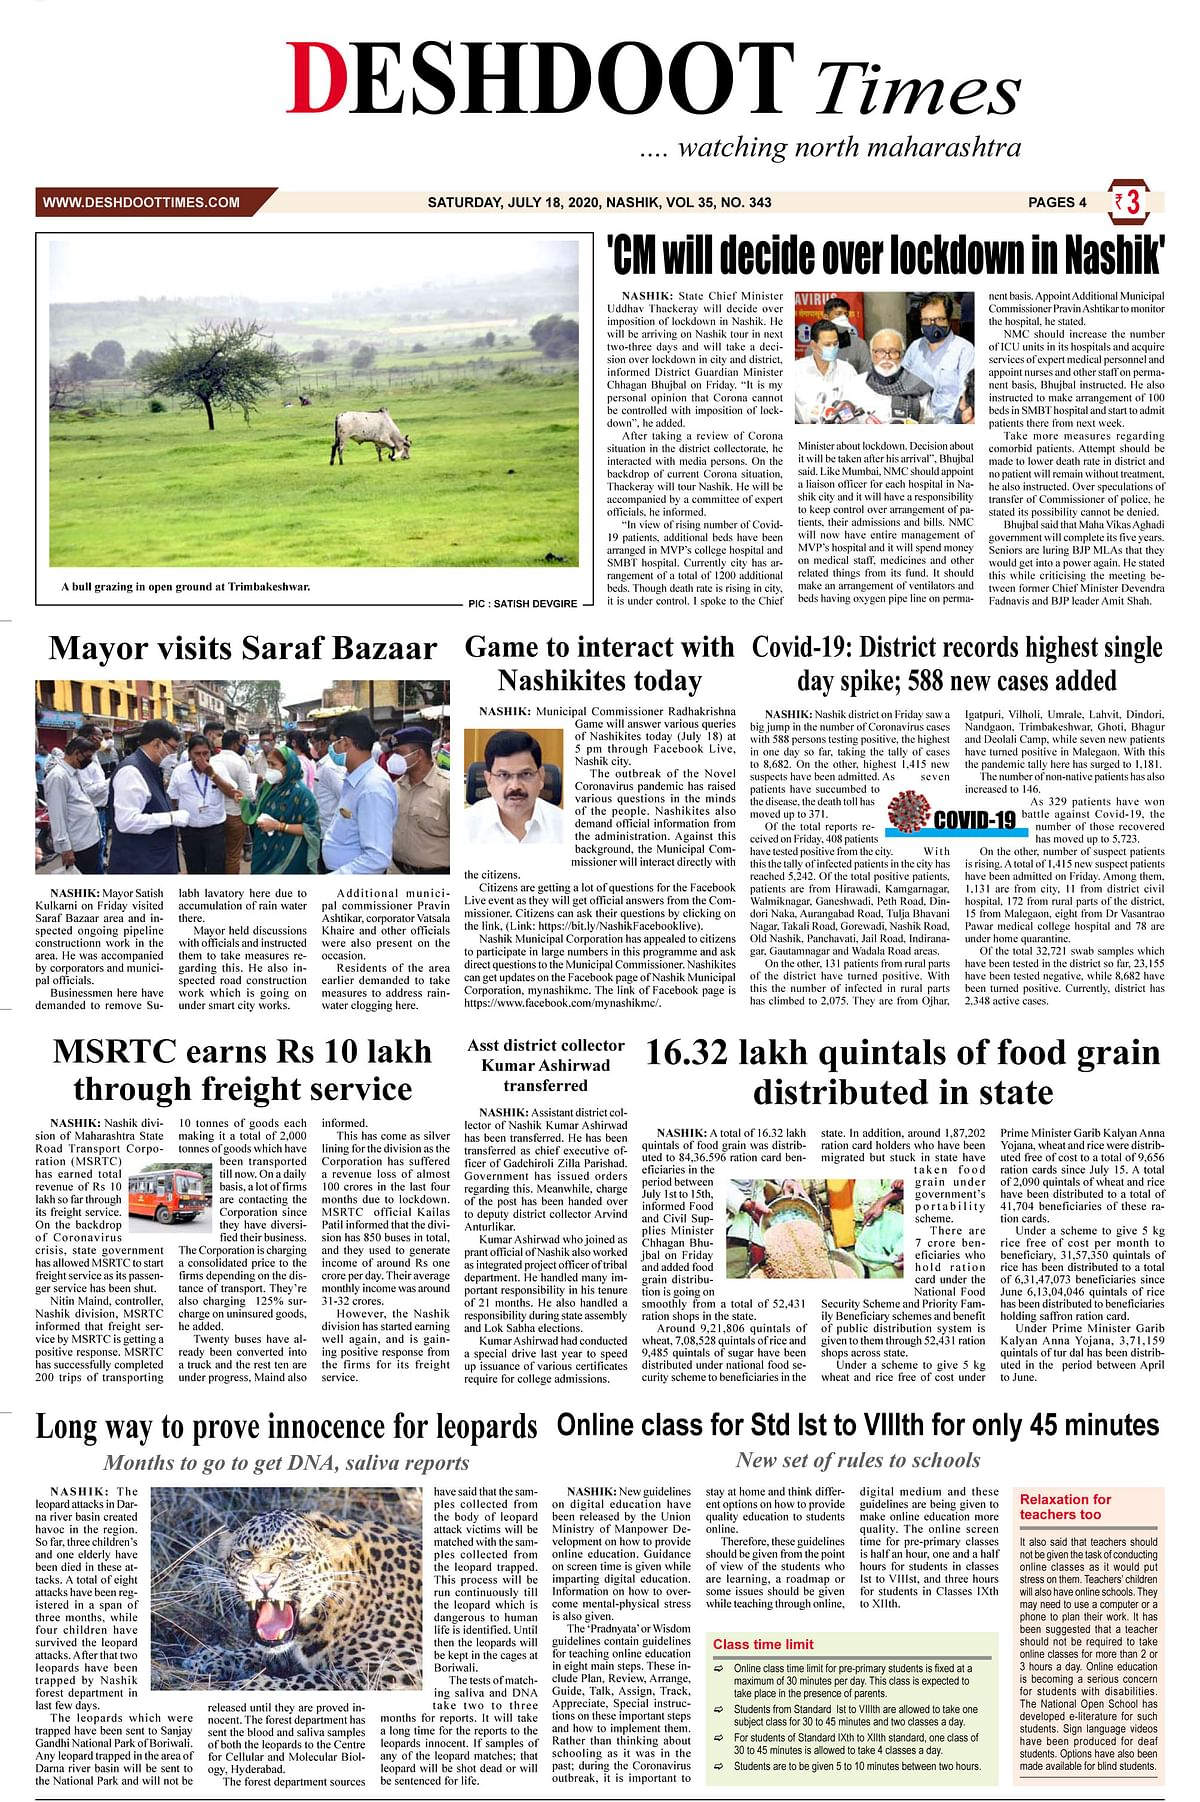 Deshdoot Times E Paper, 18 July 2020